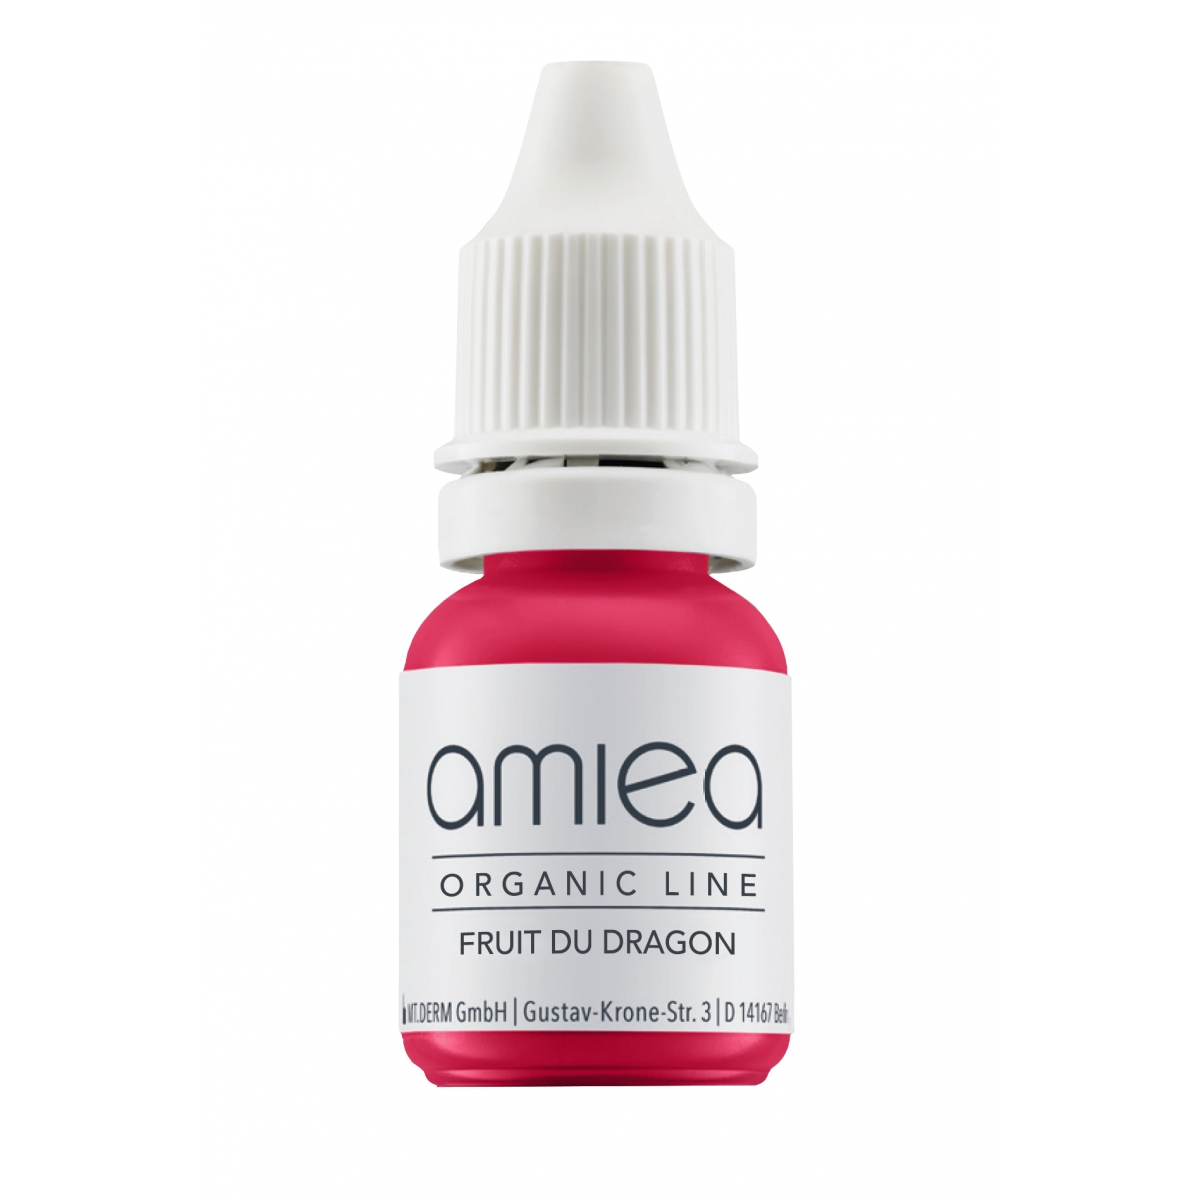 ORGANIC LINE (5ml)  - PIGMENT FRUIT DU DRAGON ORGANICLINE AMIEA (5 ml)